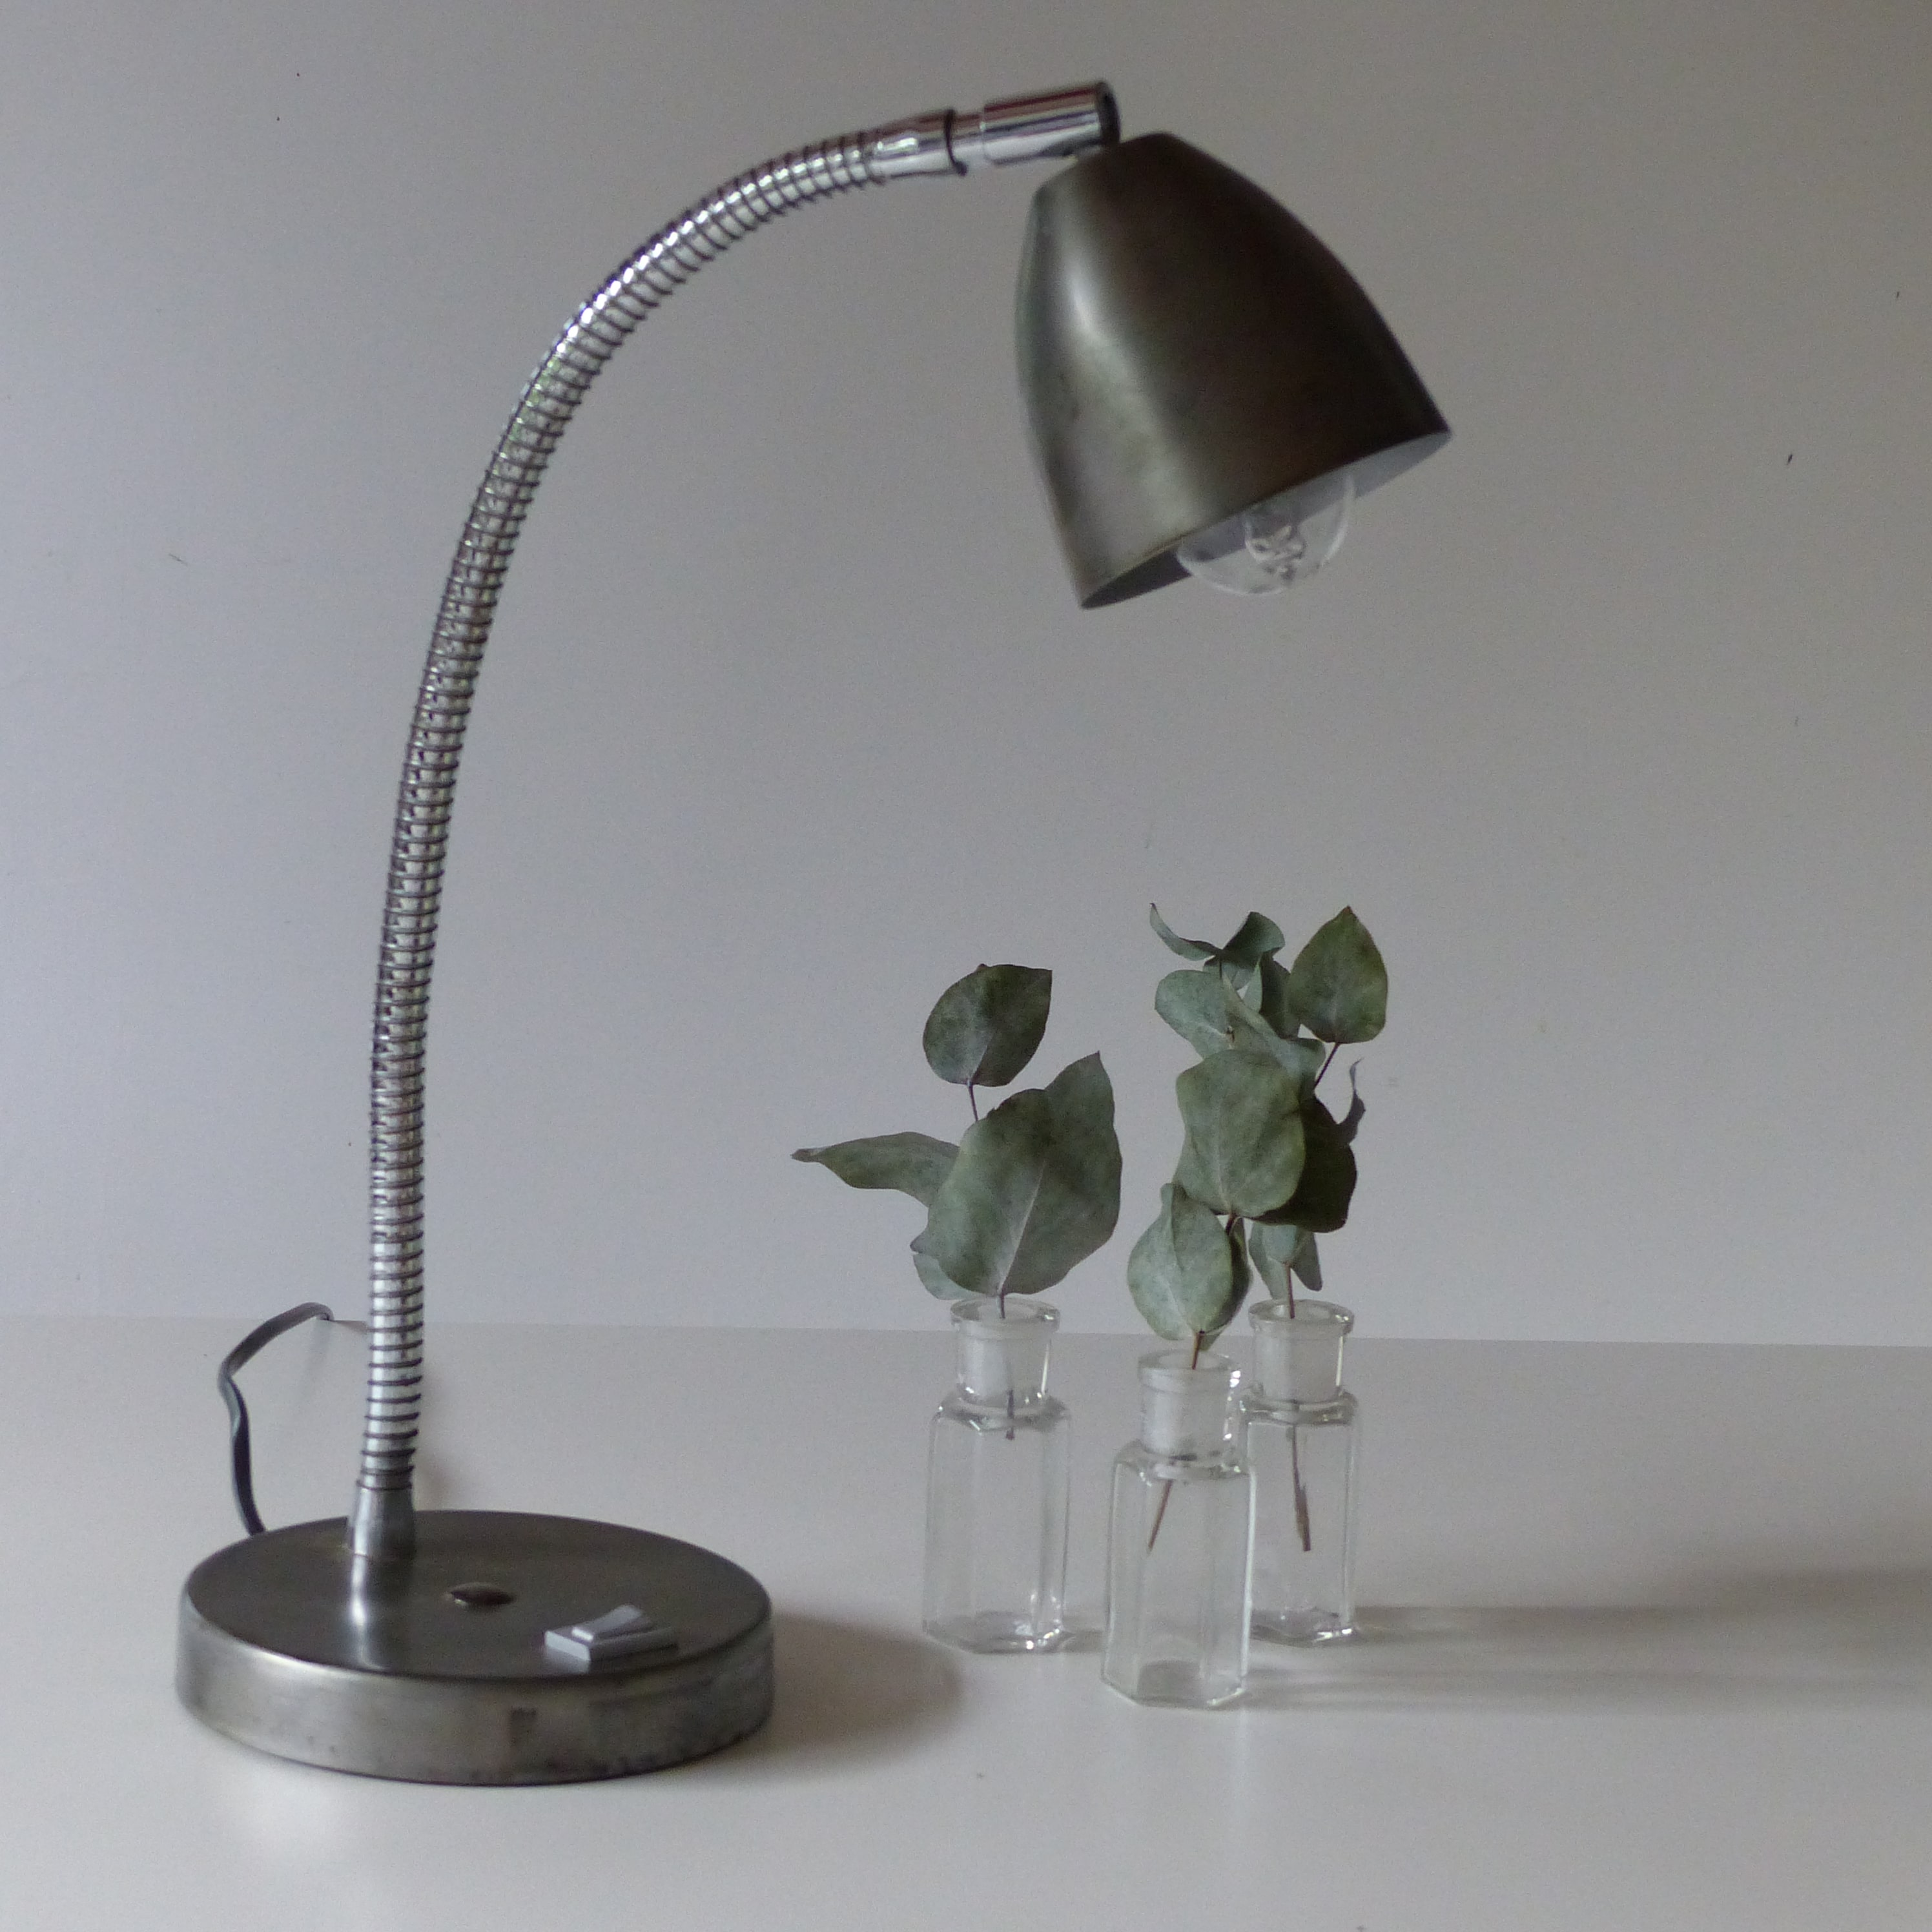 lampe cocotte en m tal brut lignedebrocante brocante en ligne chine pour vous meubles. Black Bedroom Furniture Sets. Home Design Ideas